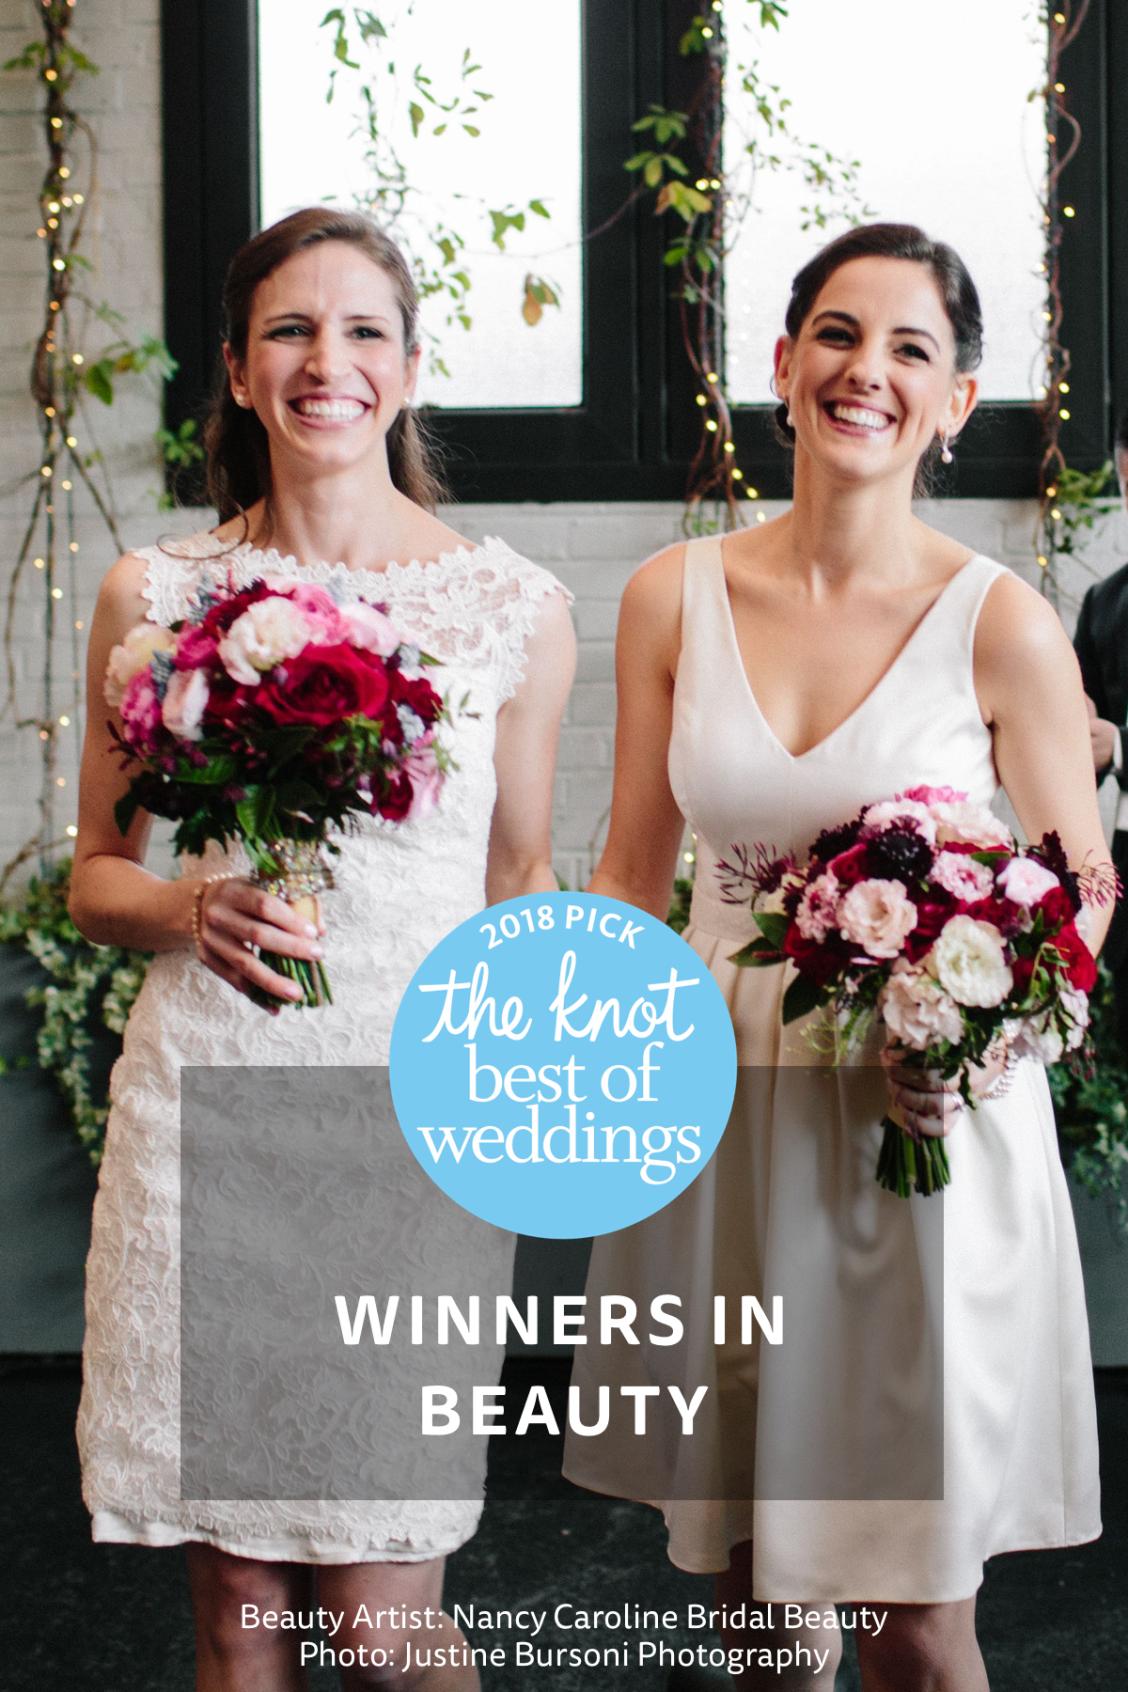 beauty salons in ashburn, va - the knot   wedding beauty